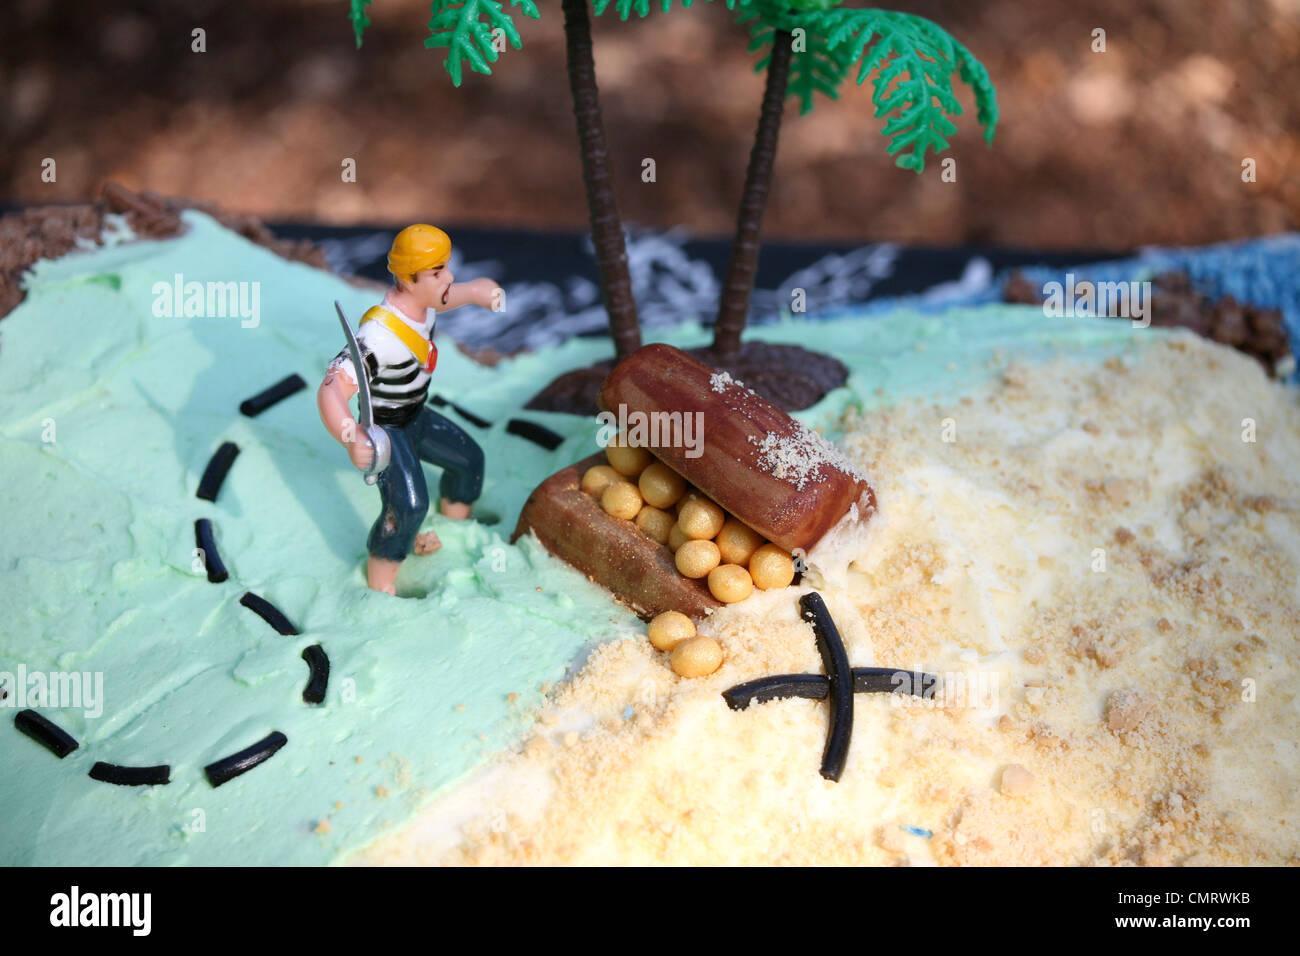 Piraten Geburtstagskuchen Stockfoto Bild 47238895 Alamy